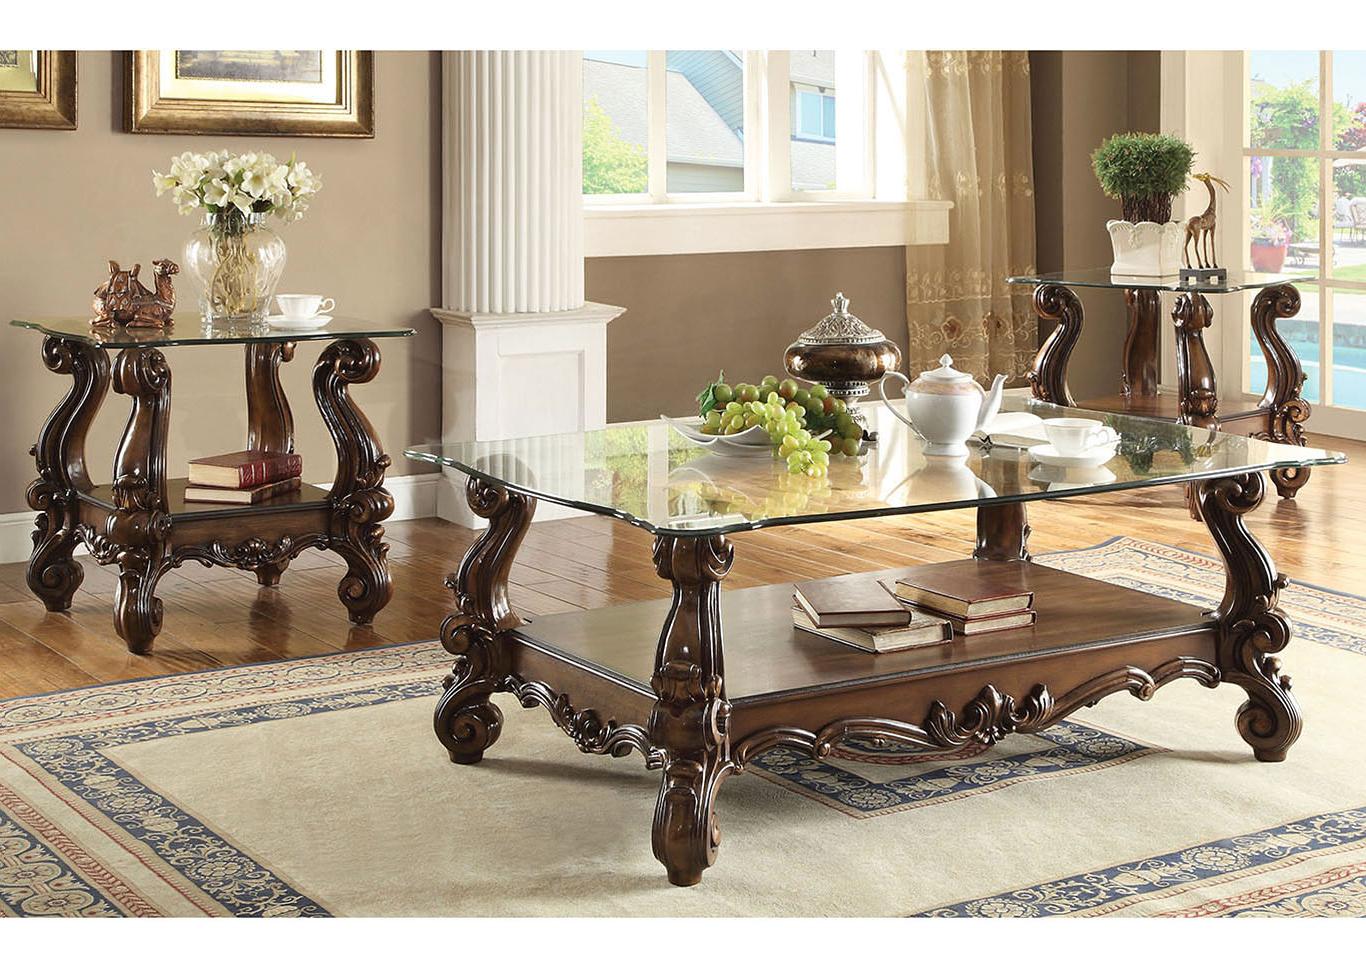 Just Furniture Versailles Cherry Oak & Clear Glass Coffee Table Regarding 2019 Furniture Of America Crescent Dark Cherry Glass Top Oval Coffee Tables (View 12 of 20)